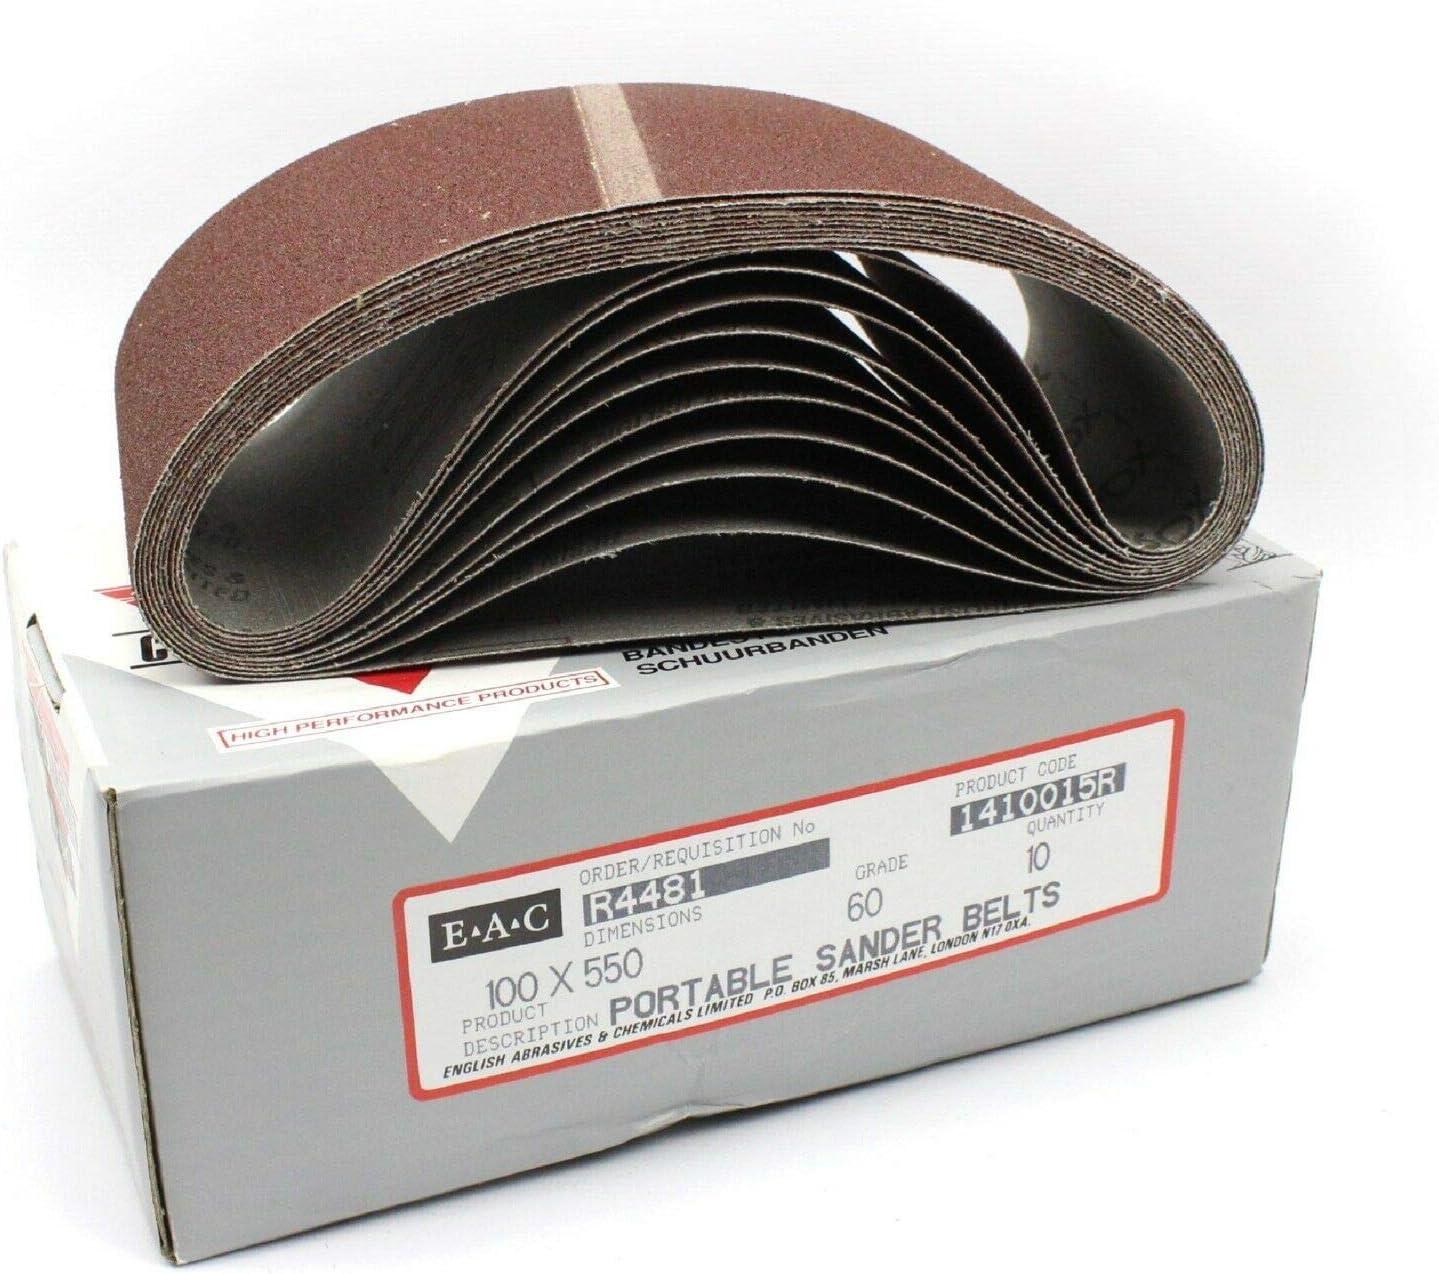 Lot de 10 bandes abrasives en oxyde daluminium 100 x 550 mm Grain 120 g.